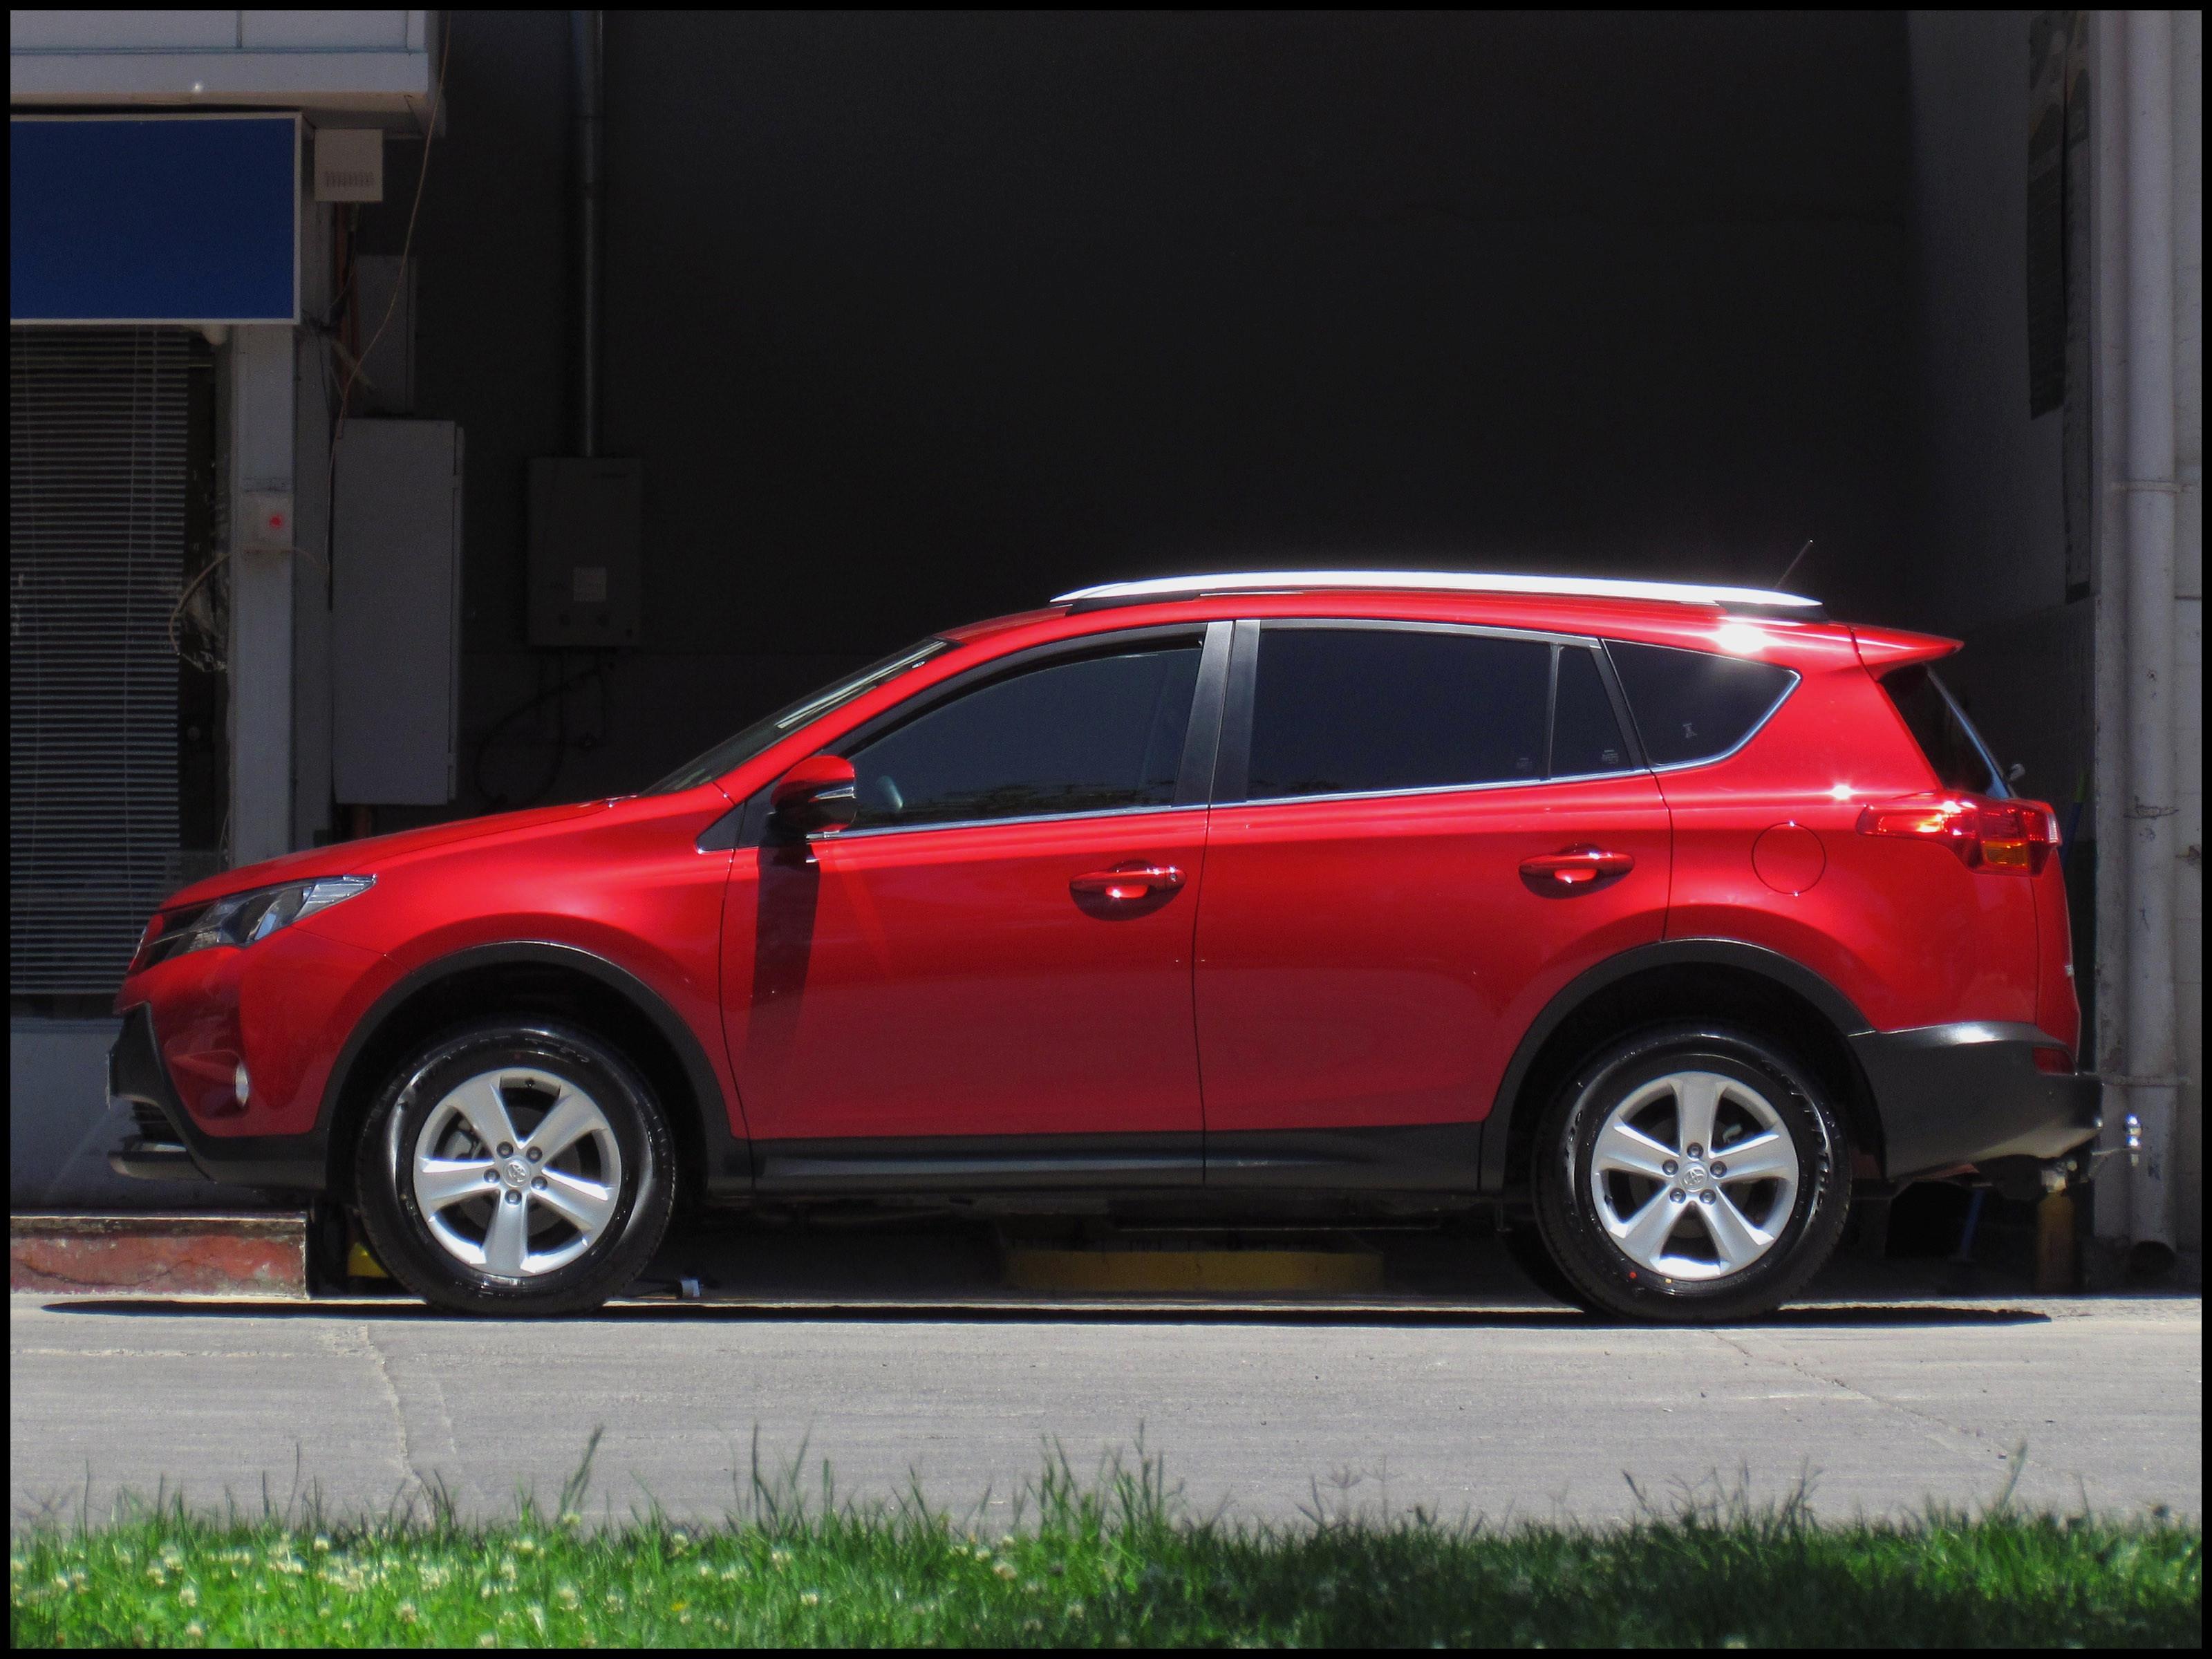 Toyota Rav4 Reliability Lovely News Rav 4 Logo toyota Rav4 Interior Awesome toyota Rav4 2 0d